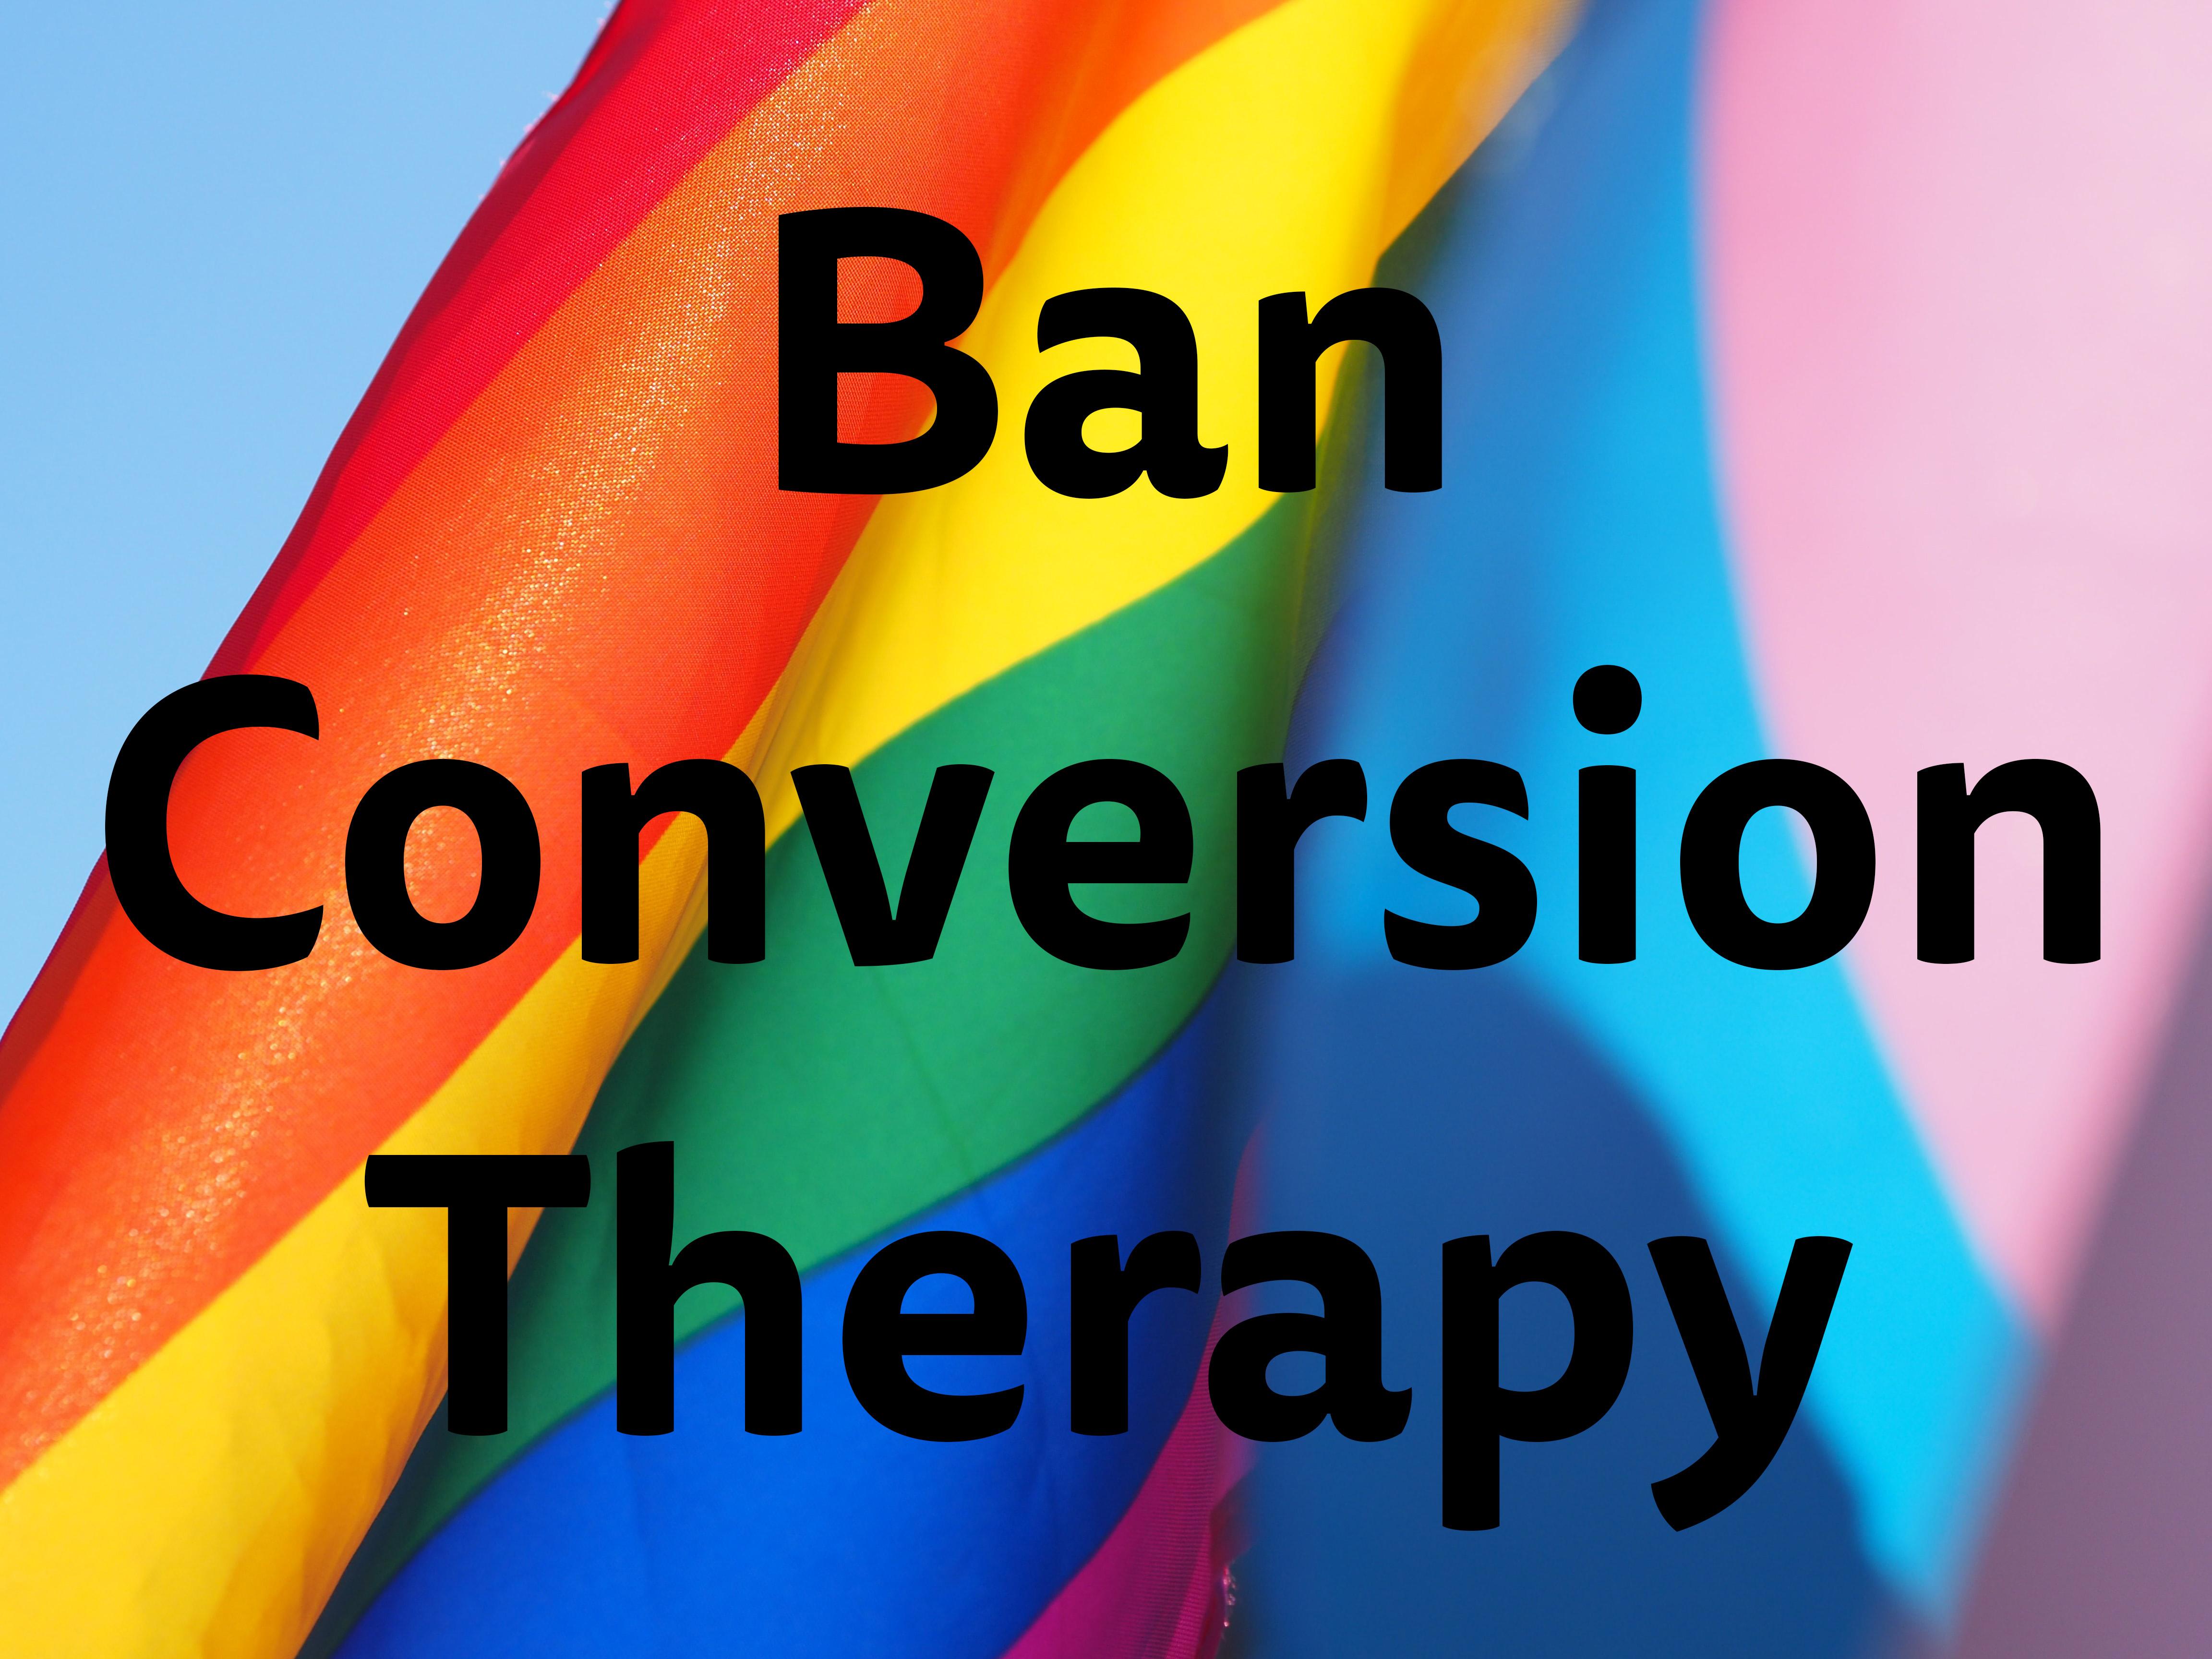 conversion therapy - photo #29